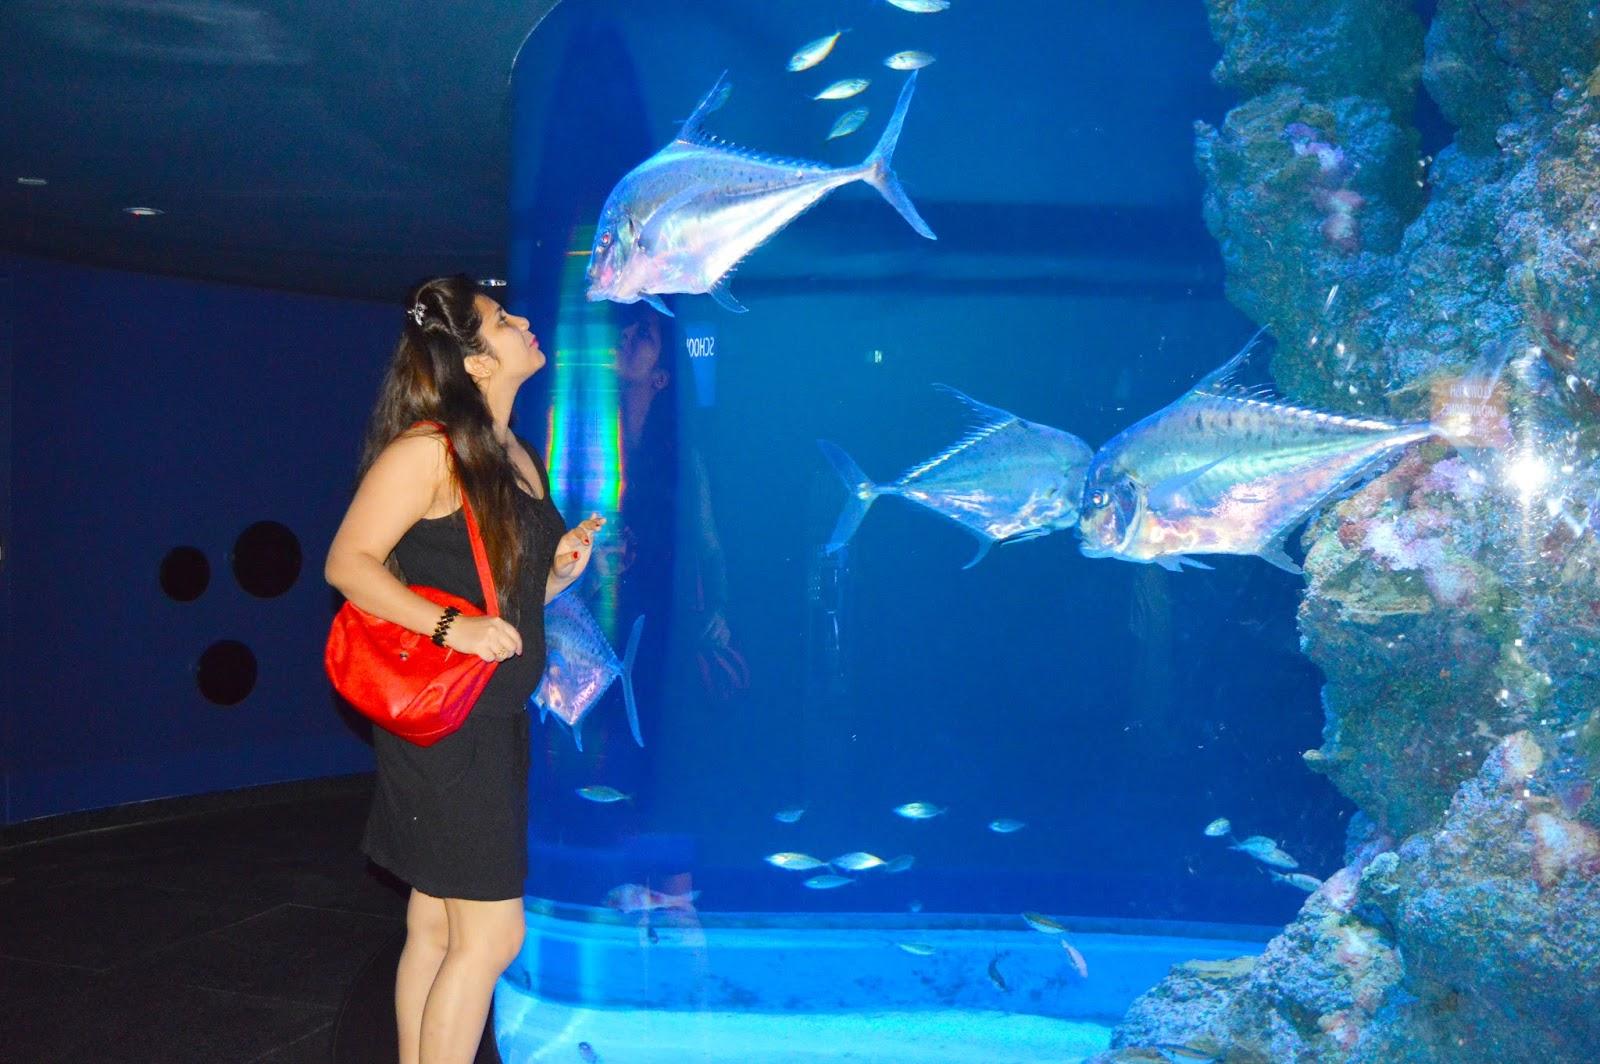 Nitsa Know Your New Self At Sentosa Island Along With Universal Tiket Madame Tussauds Singapore Varied Sea Life Aquarium